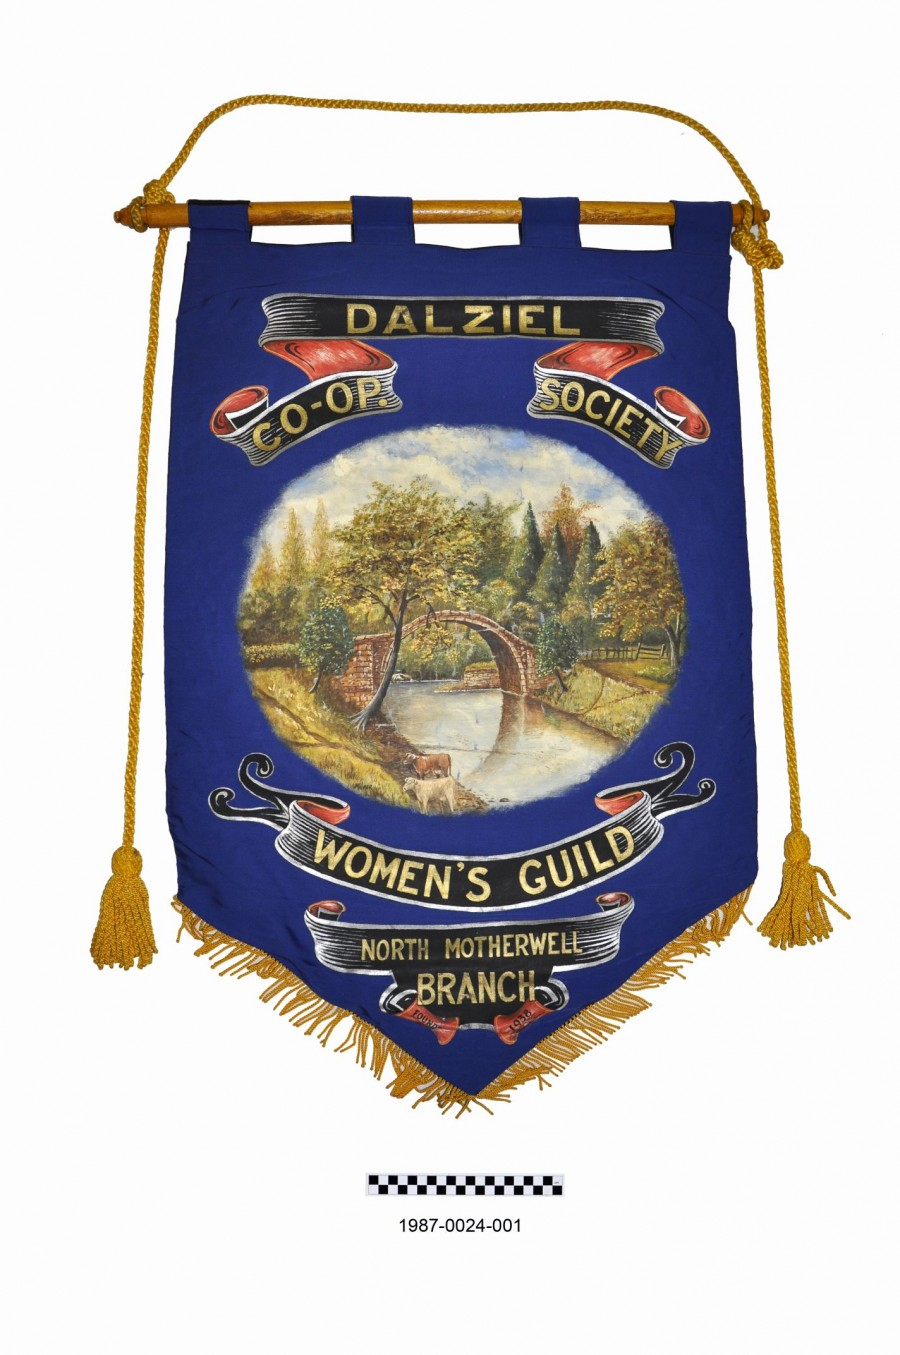 Dalziel Co-op Banner